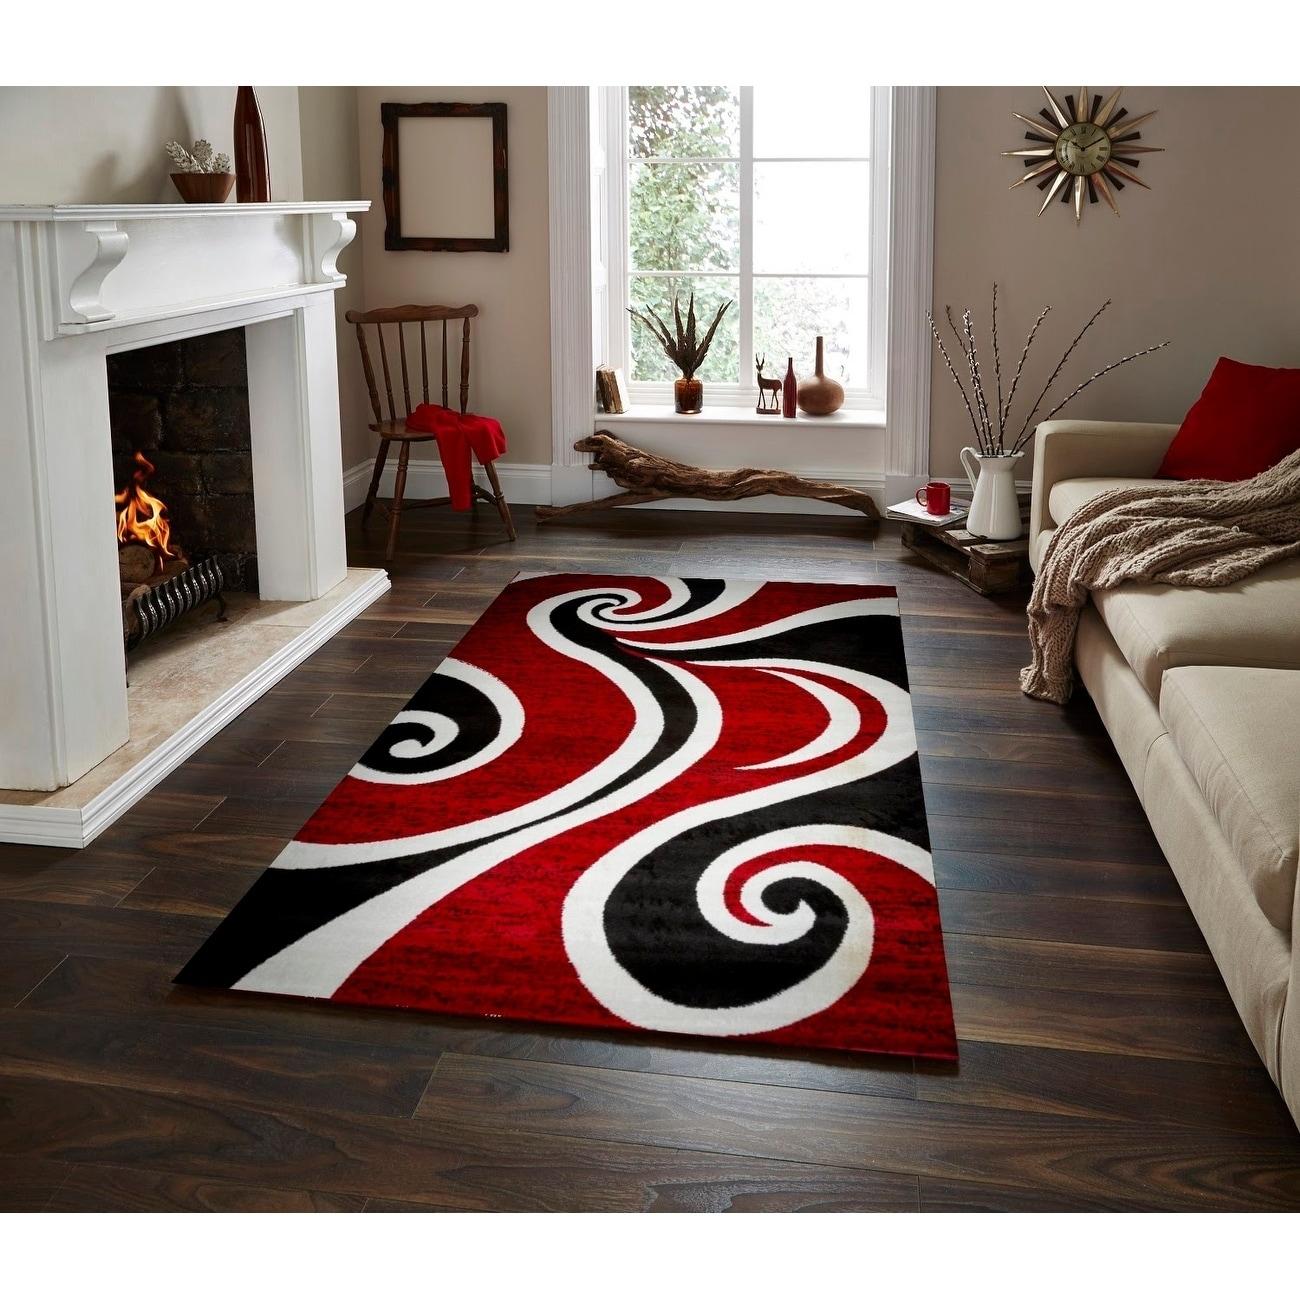 Mckenzie Red Black White Area Rug